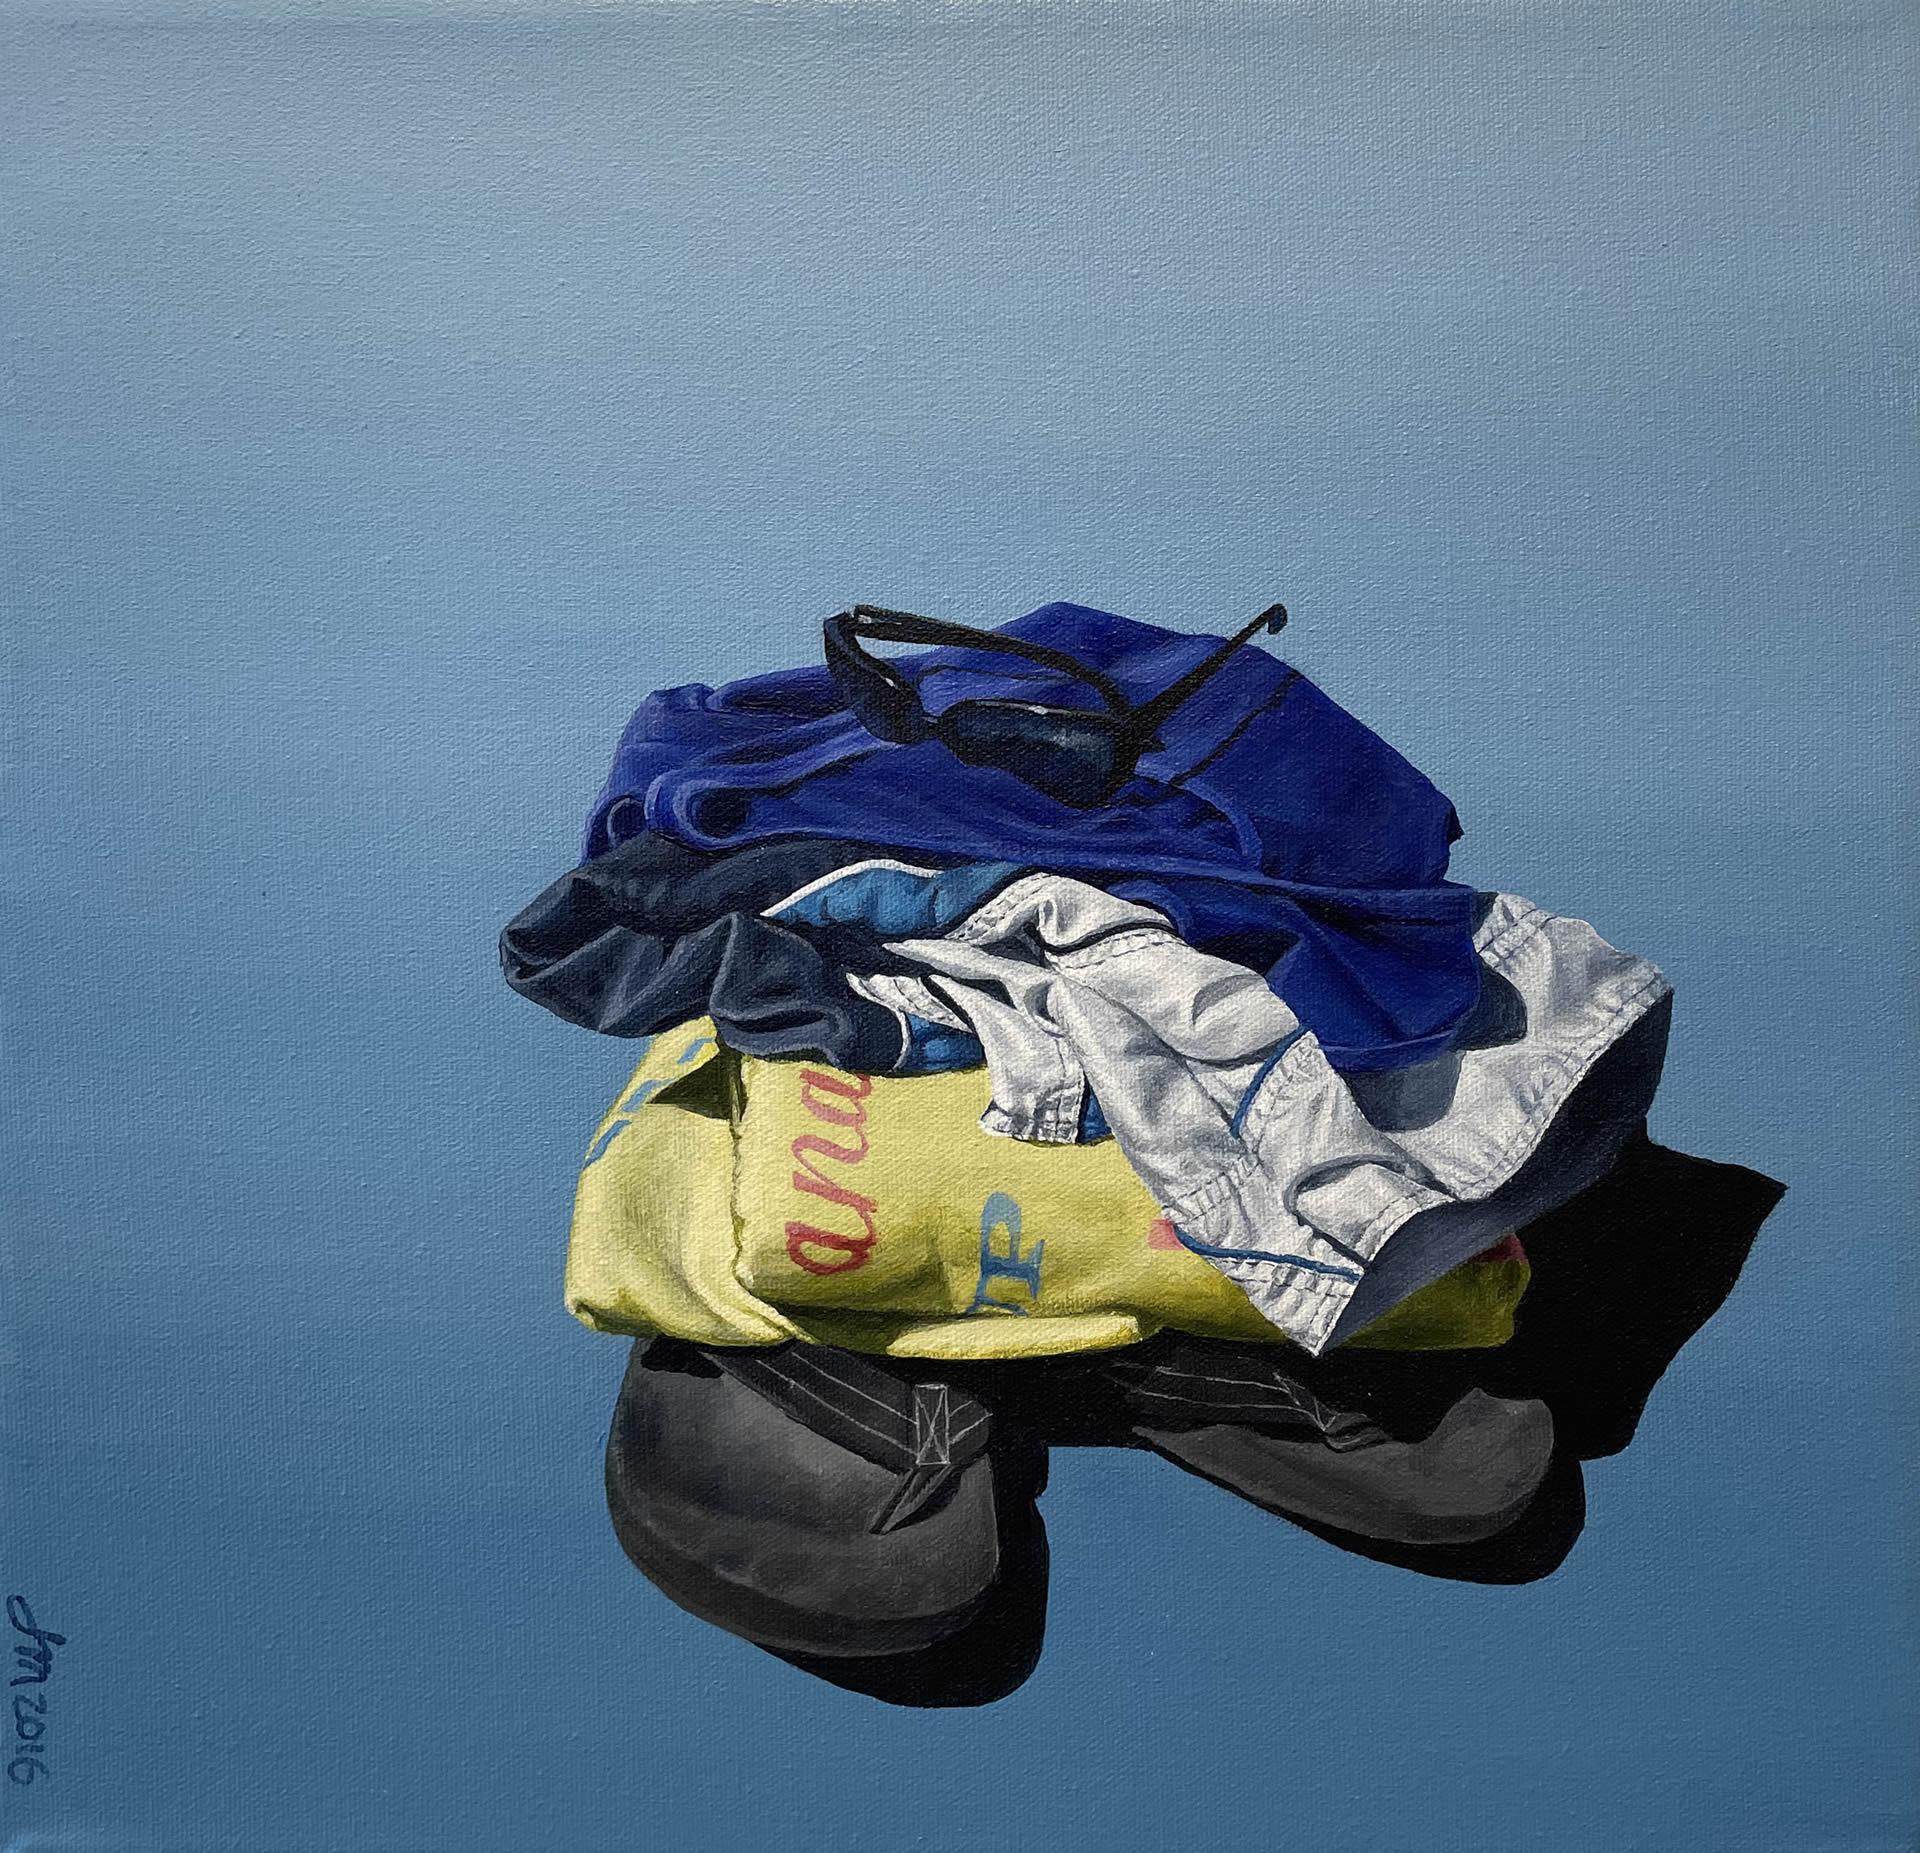 Jana-Rayne-MacDonald-On-The-Beach-12x12-Online-Art-Galleries